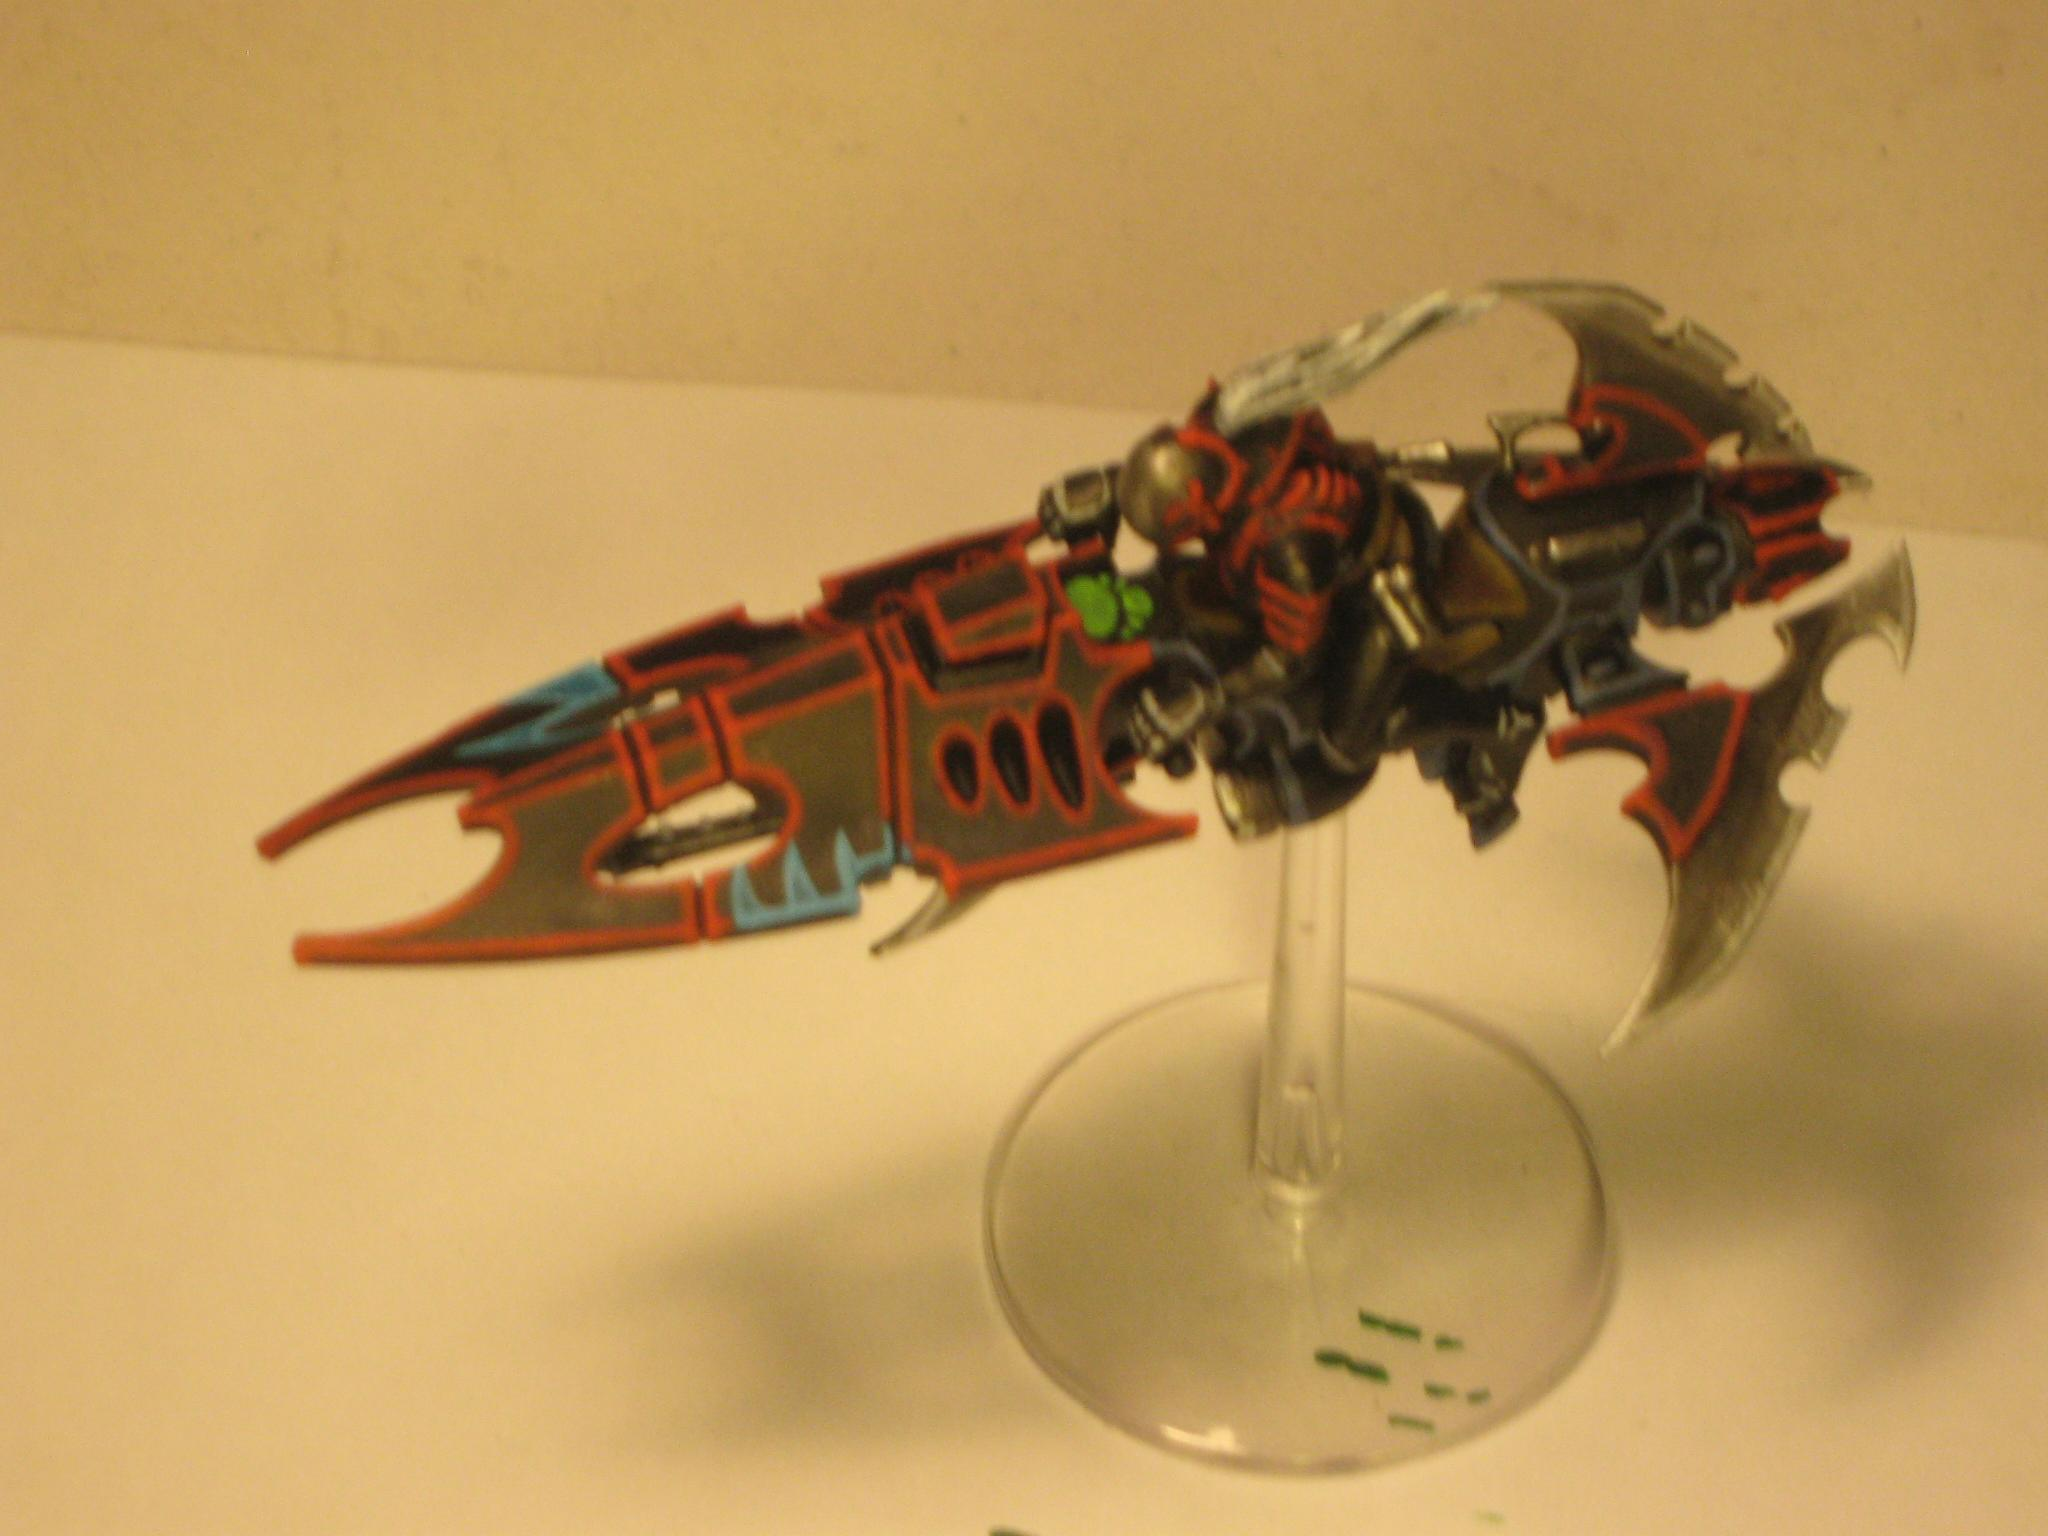 Color Scheme, Dark Eldar, De, New Army, New Dark Eldar, Reaver, Warhammer 40,000, Wyches